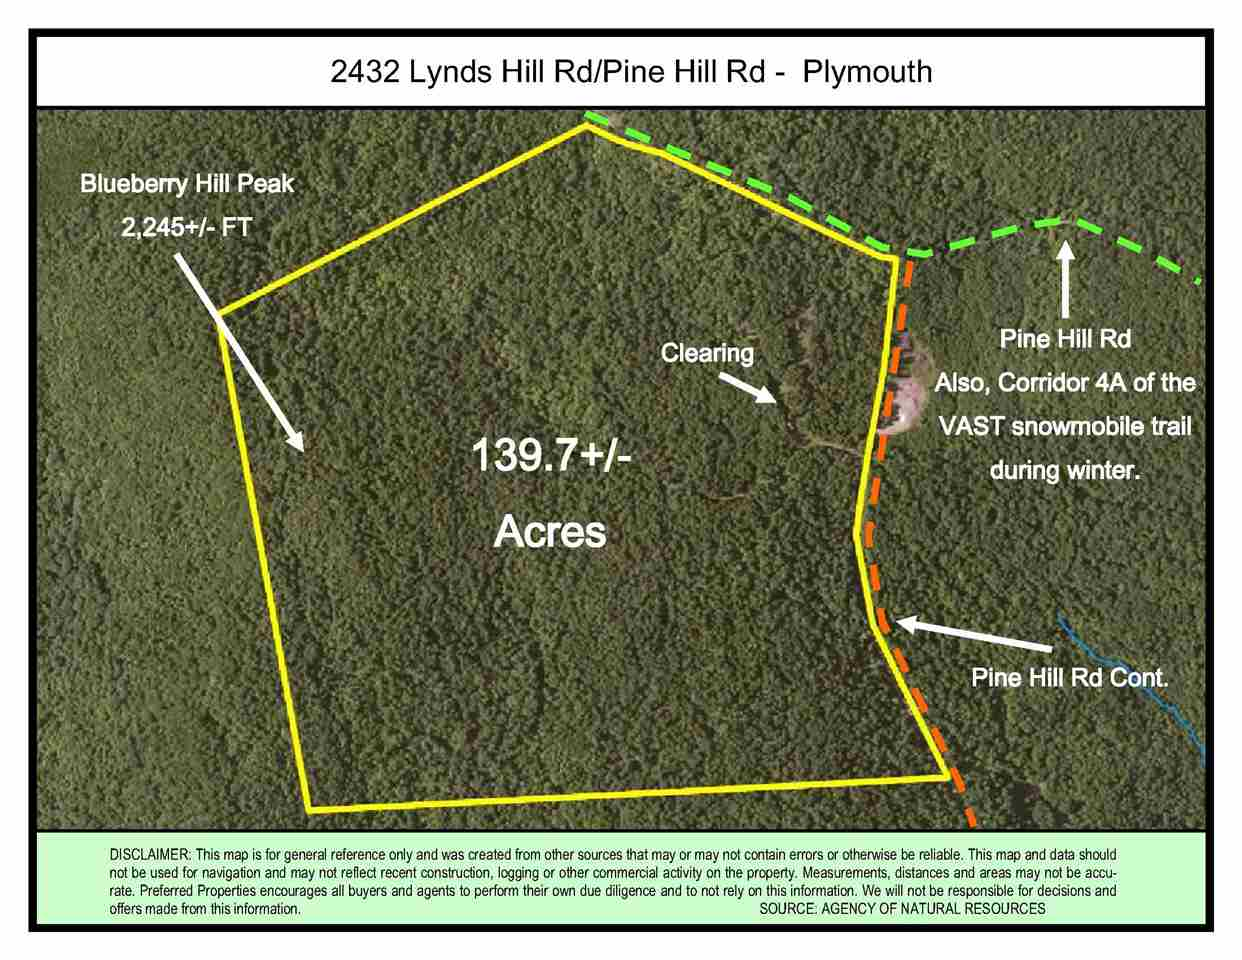 2432 Lynds Hill Rd/Pine Hill Rd, Plymouth, VT 05056